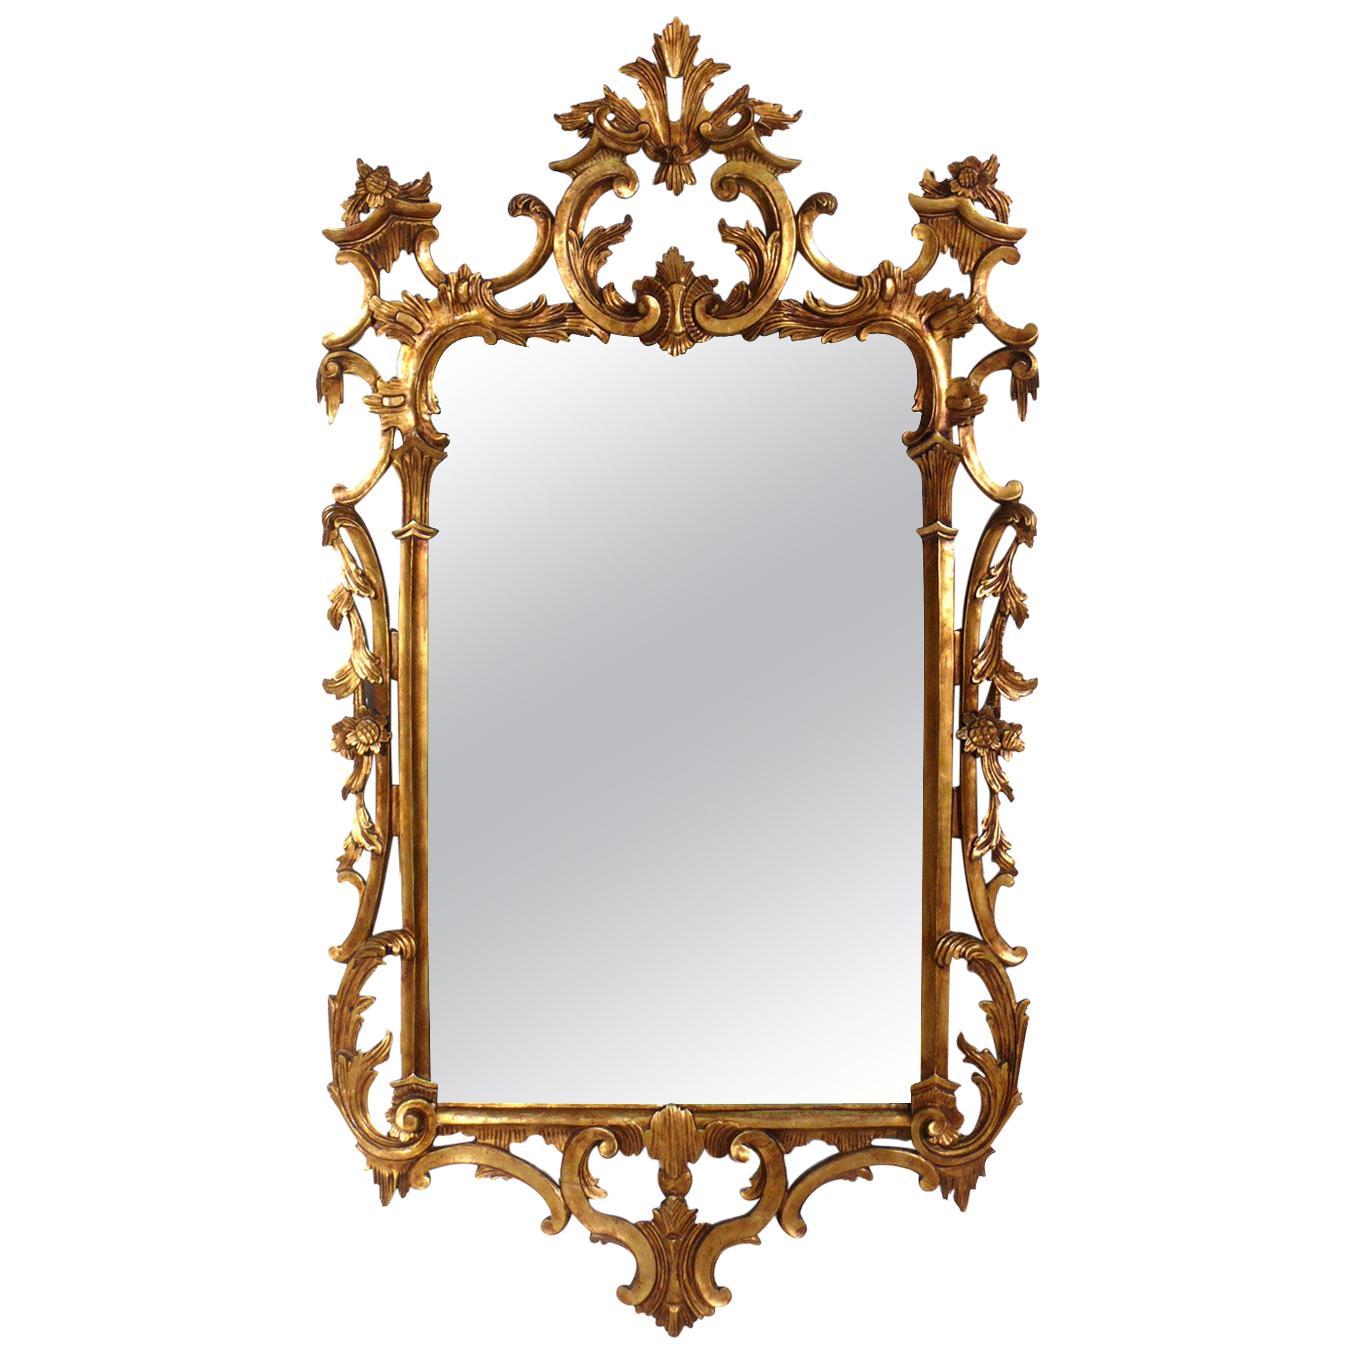 Ornate Italian Gilt Mirror